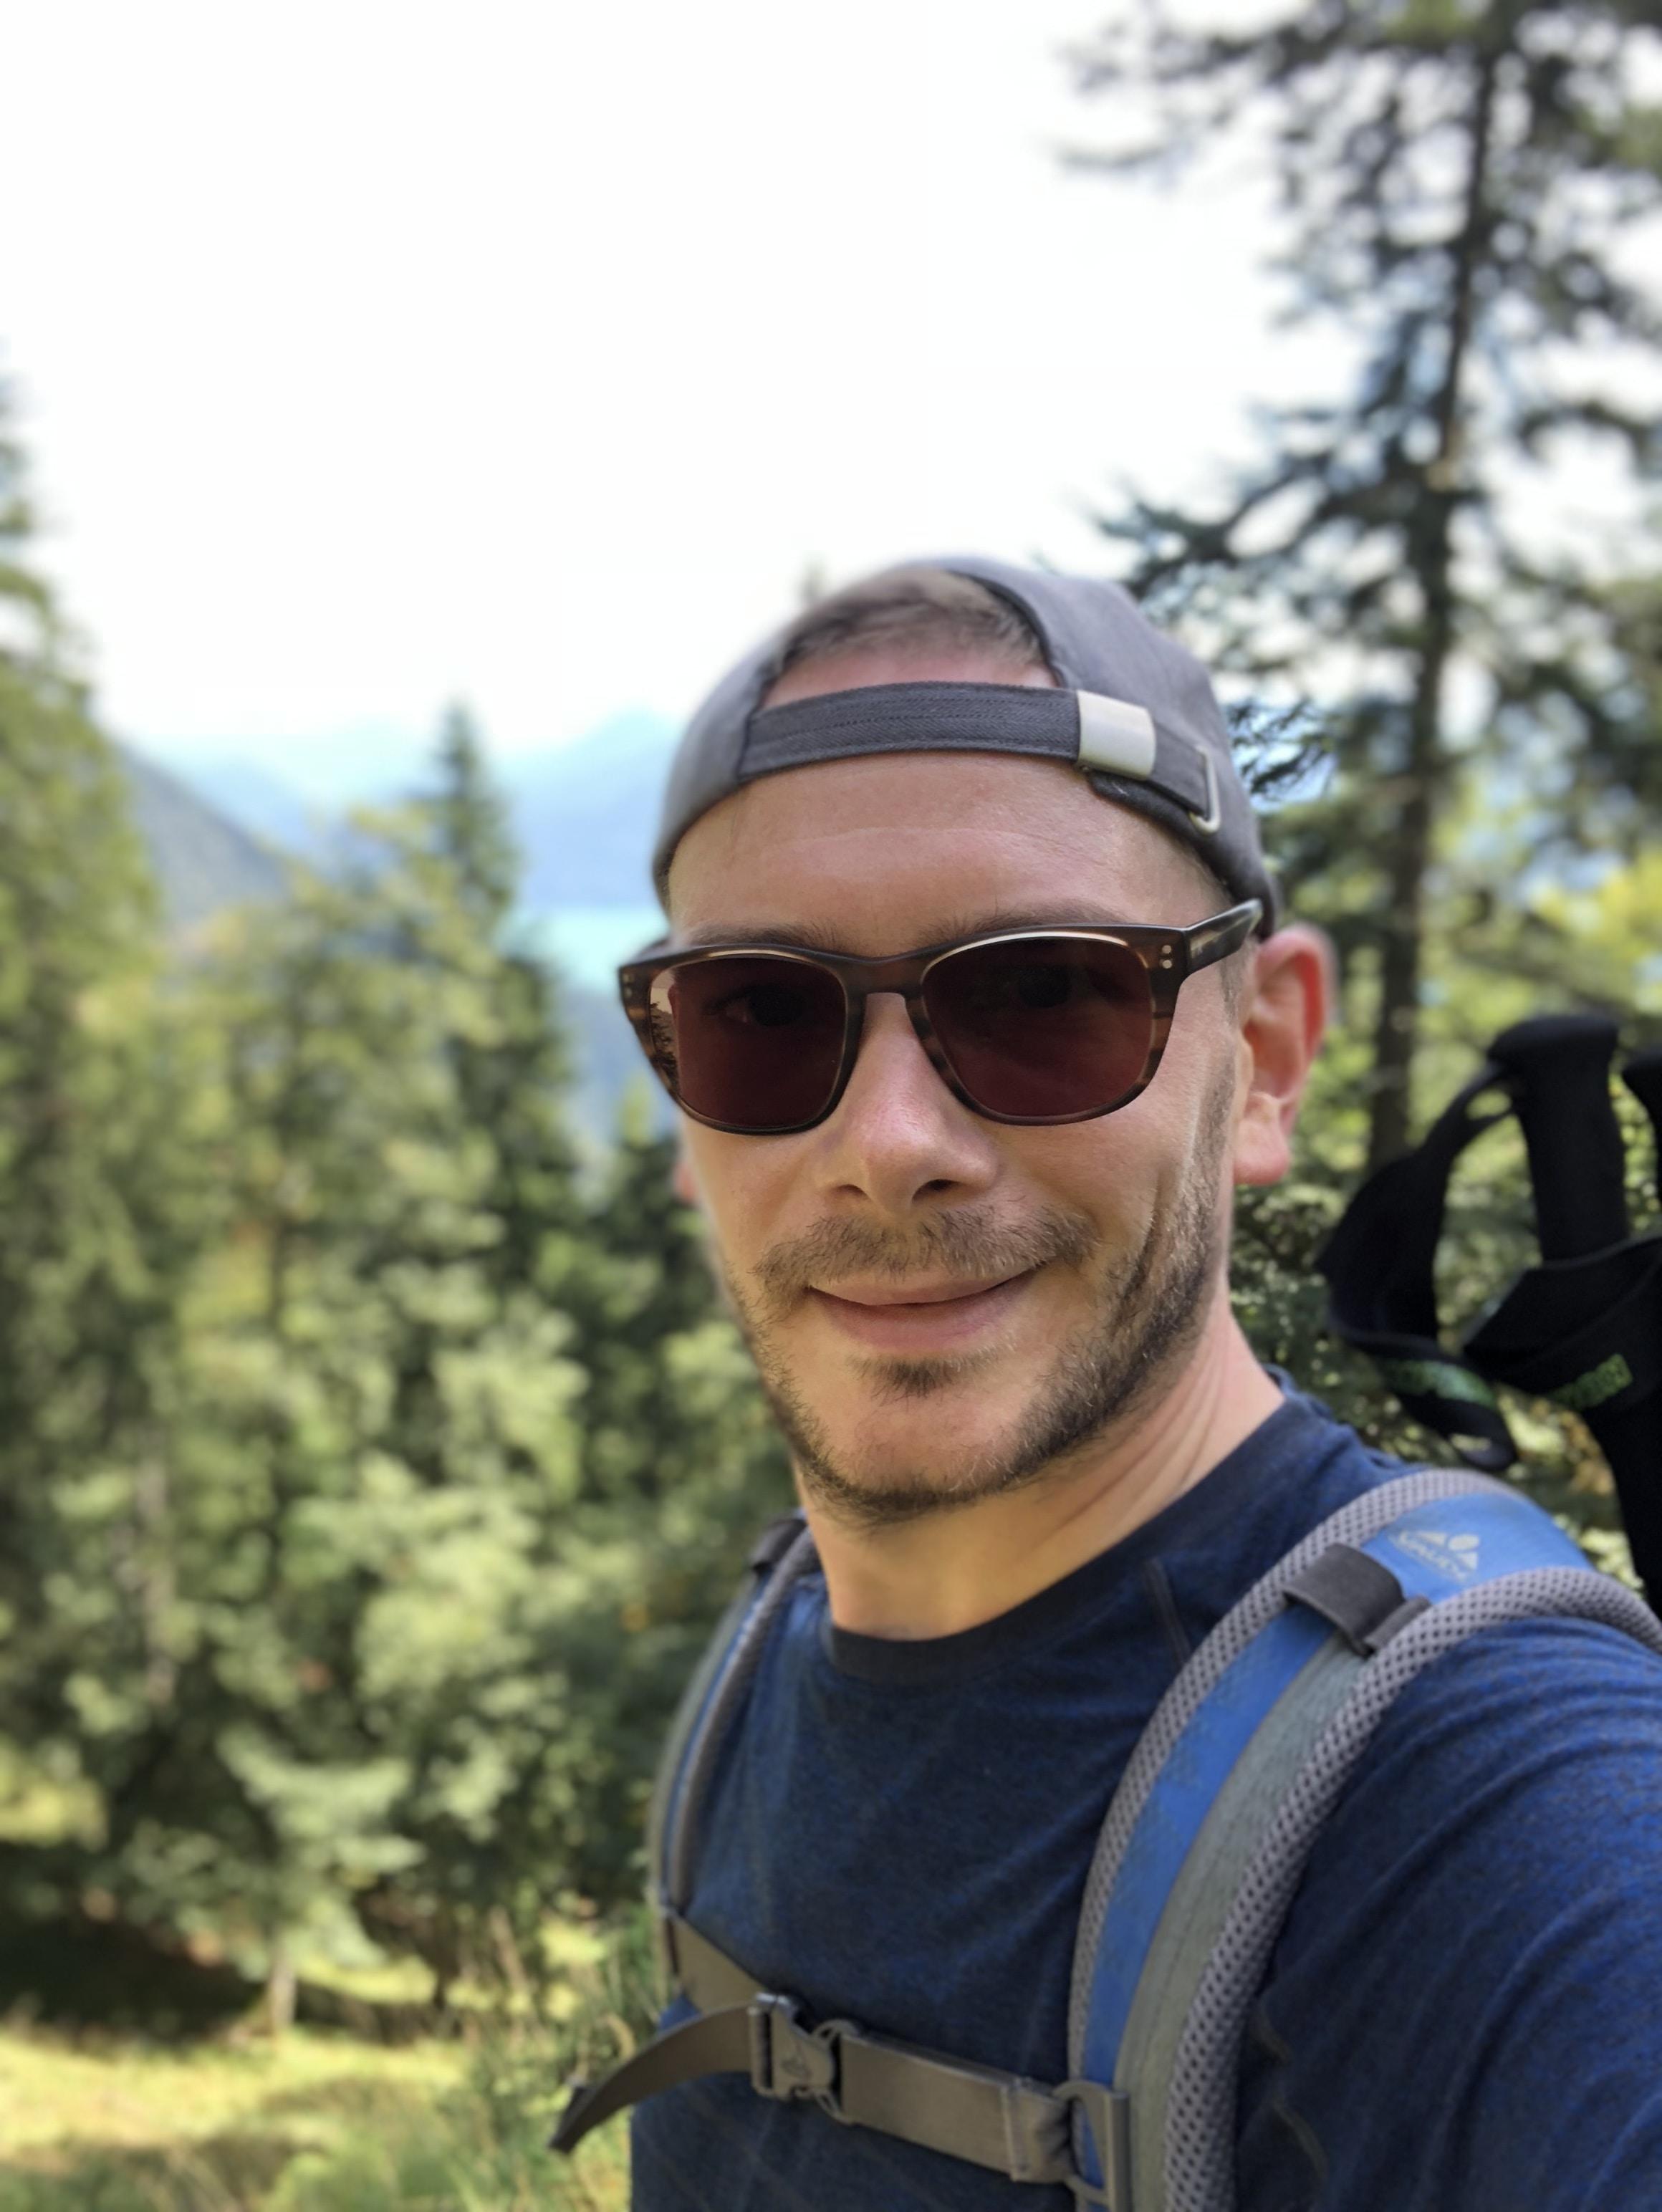 Go to Matthias Schröder's profile